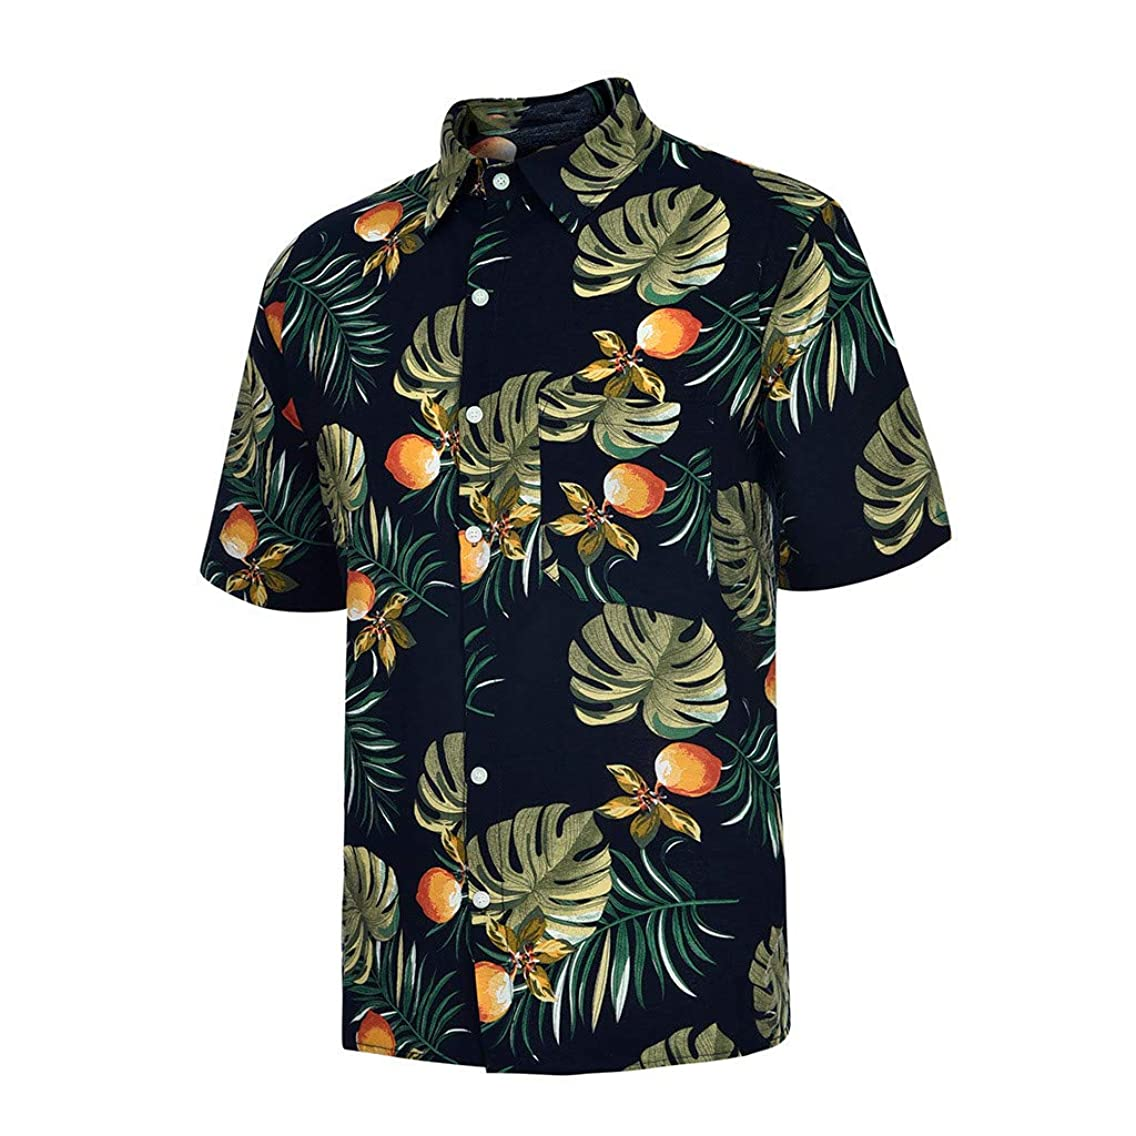 Rakkiss_Men Shirts Fashion Bohe Printed Tops Casual Slim Fit Turn-Down Collar Tee Short Sleeve Summer Blouse